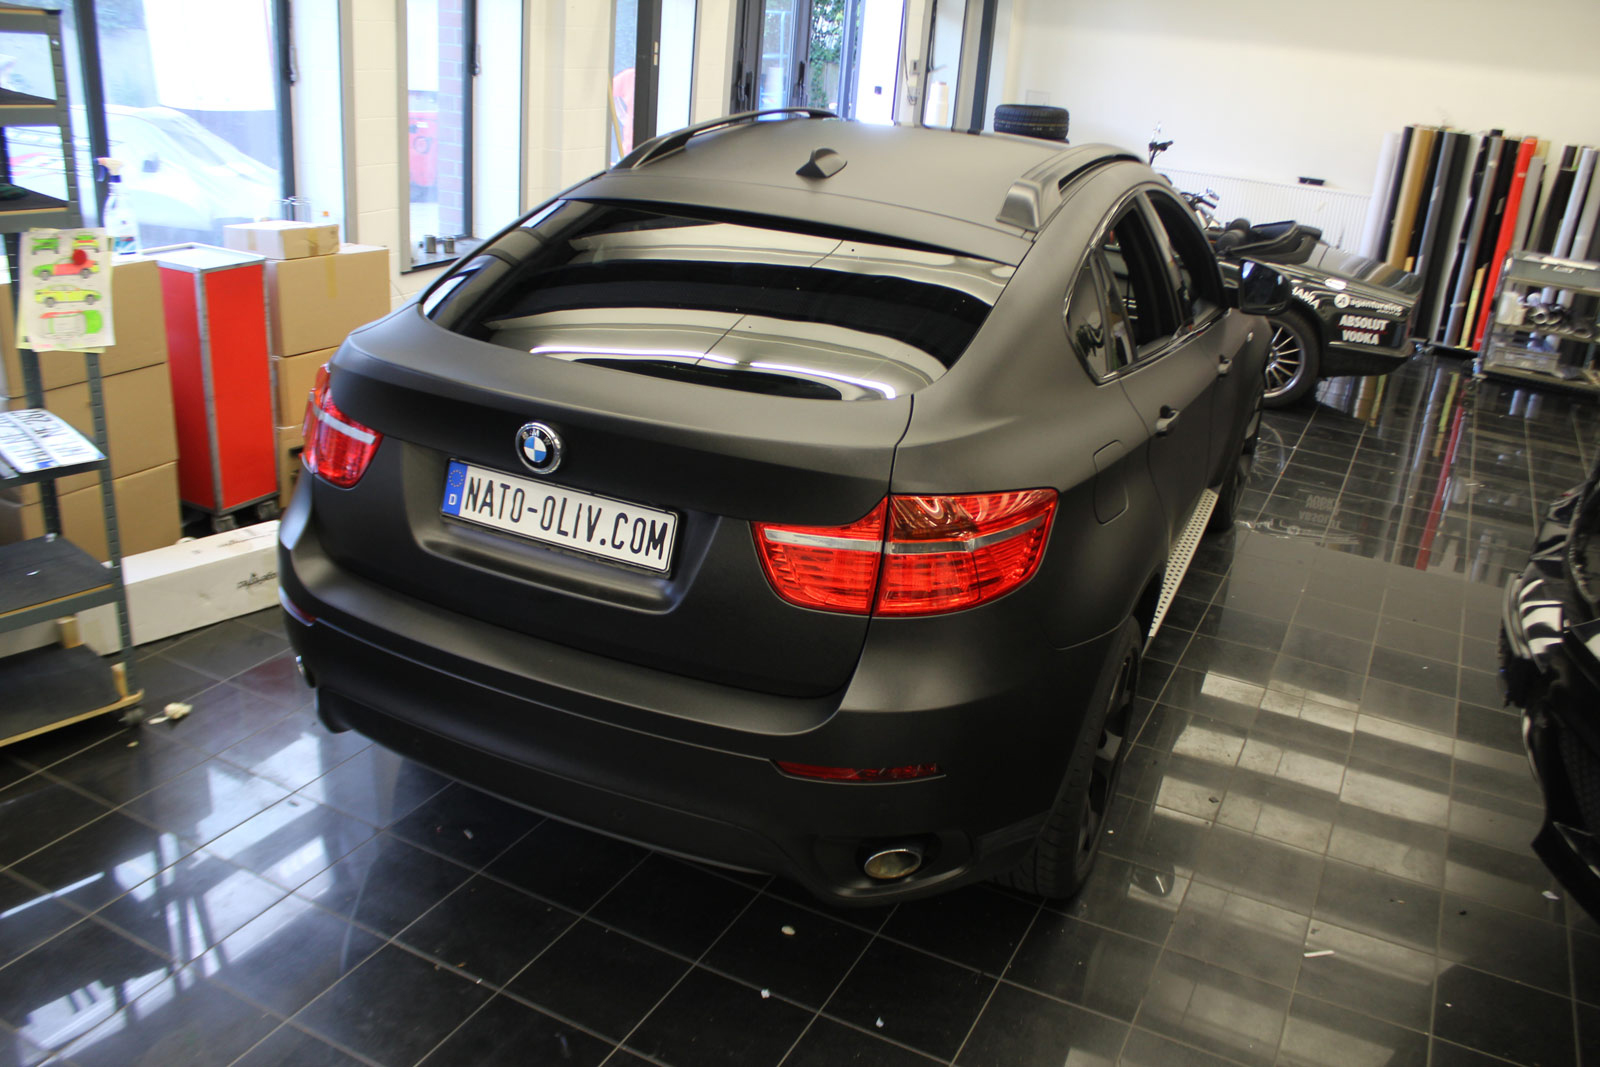 BMW_X6_FOLIERUNG_SCHWARZ_METALLIC_MATT_06